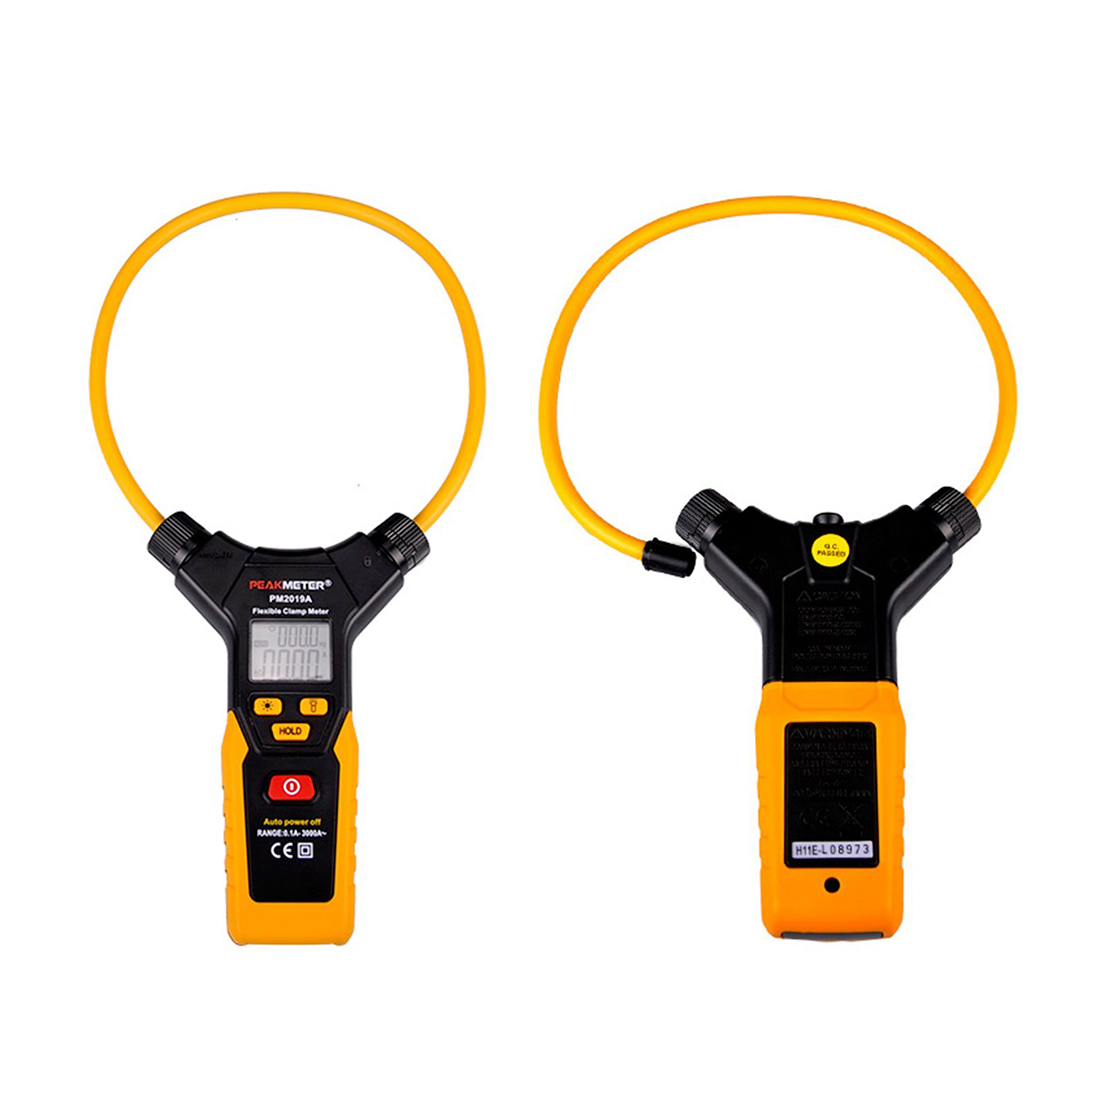 PEAKMETER PM2019A AC Digital Flexible Clamp Meter Orange with Large Size de 3100r pocket size ac digital clamp meter